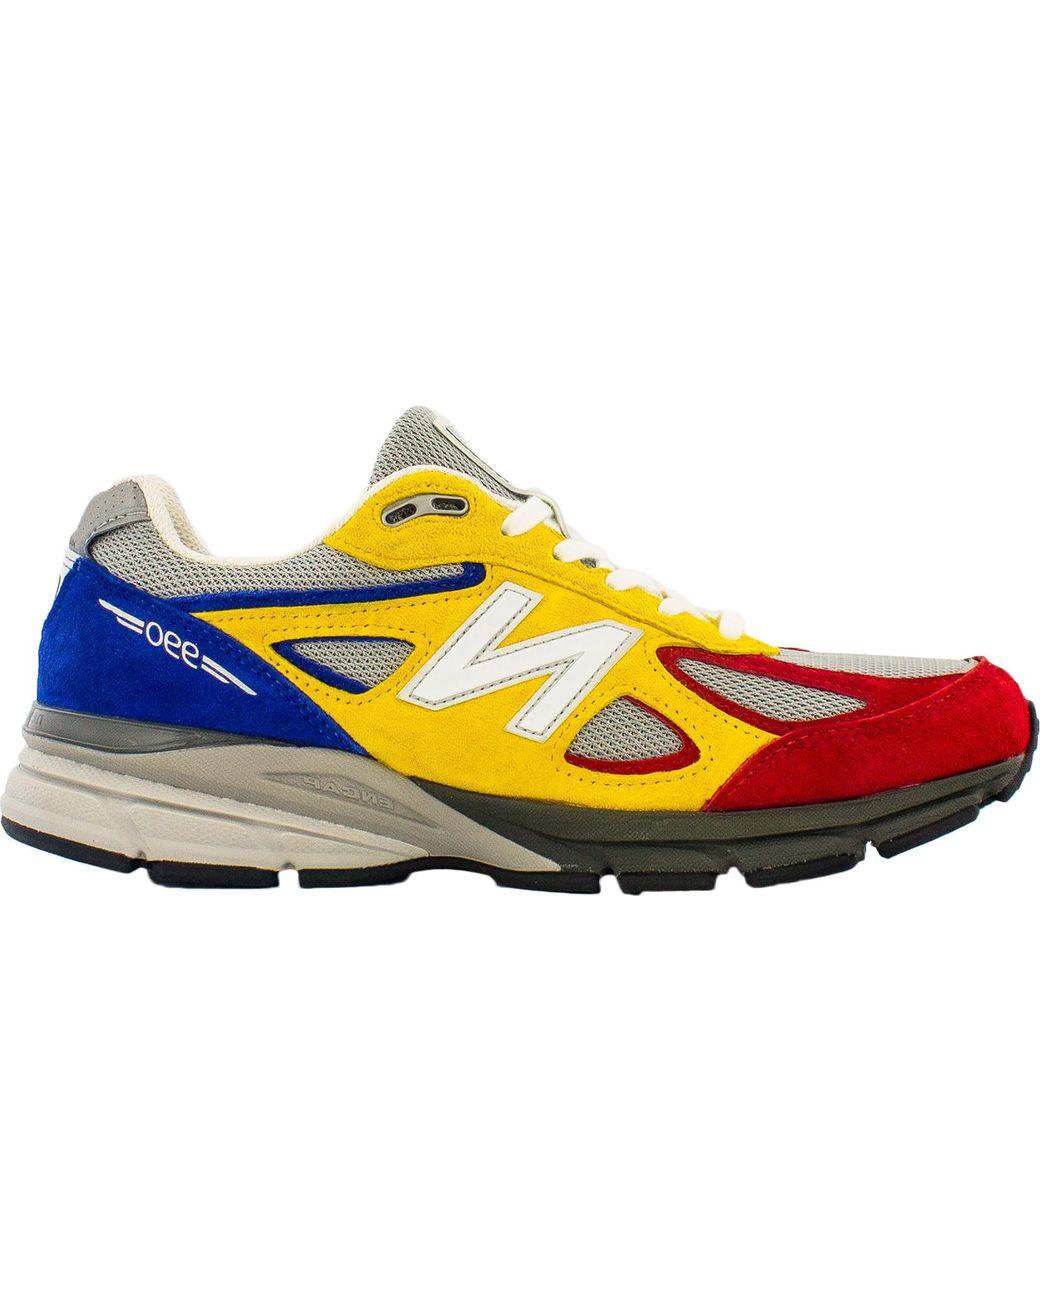 New Balance 990v4 Shoe City X Eat in